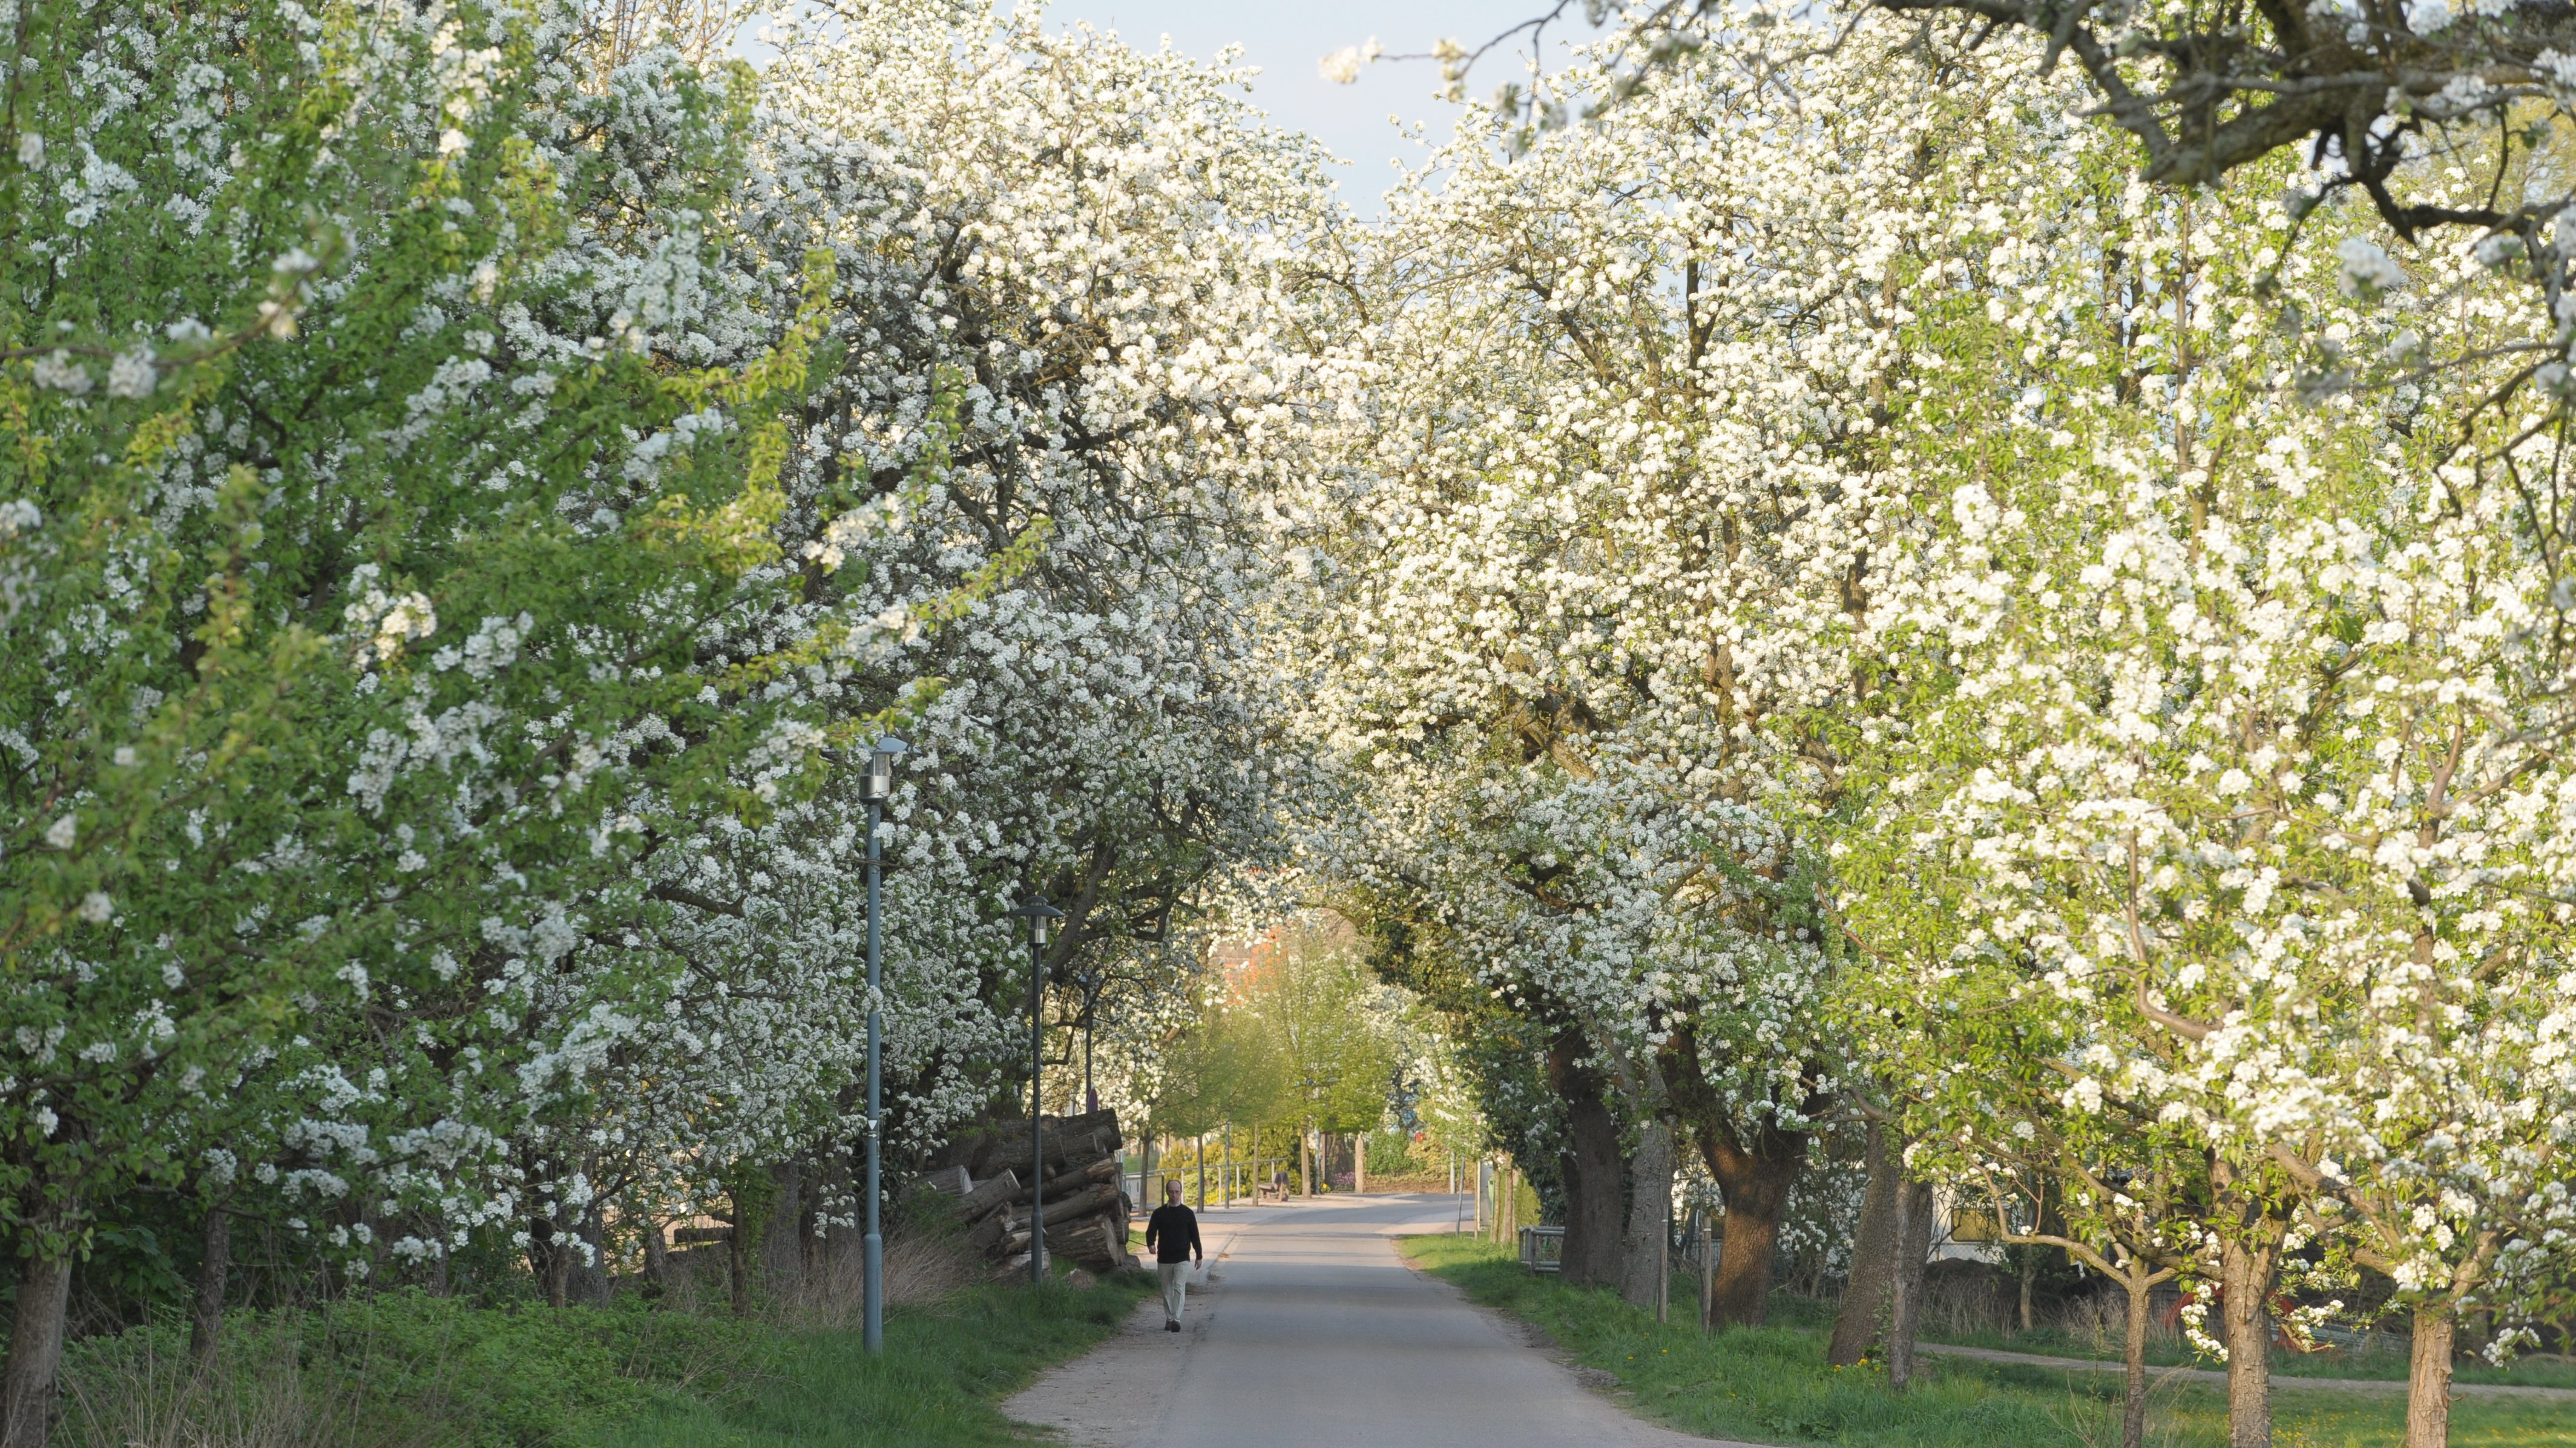 Umwelt Natur Oberhausen Rheinhausen